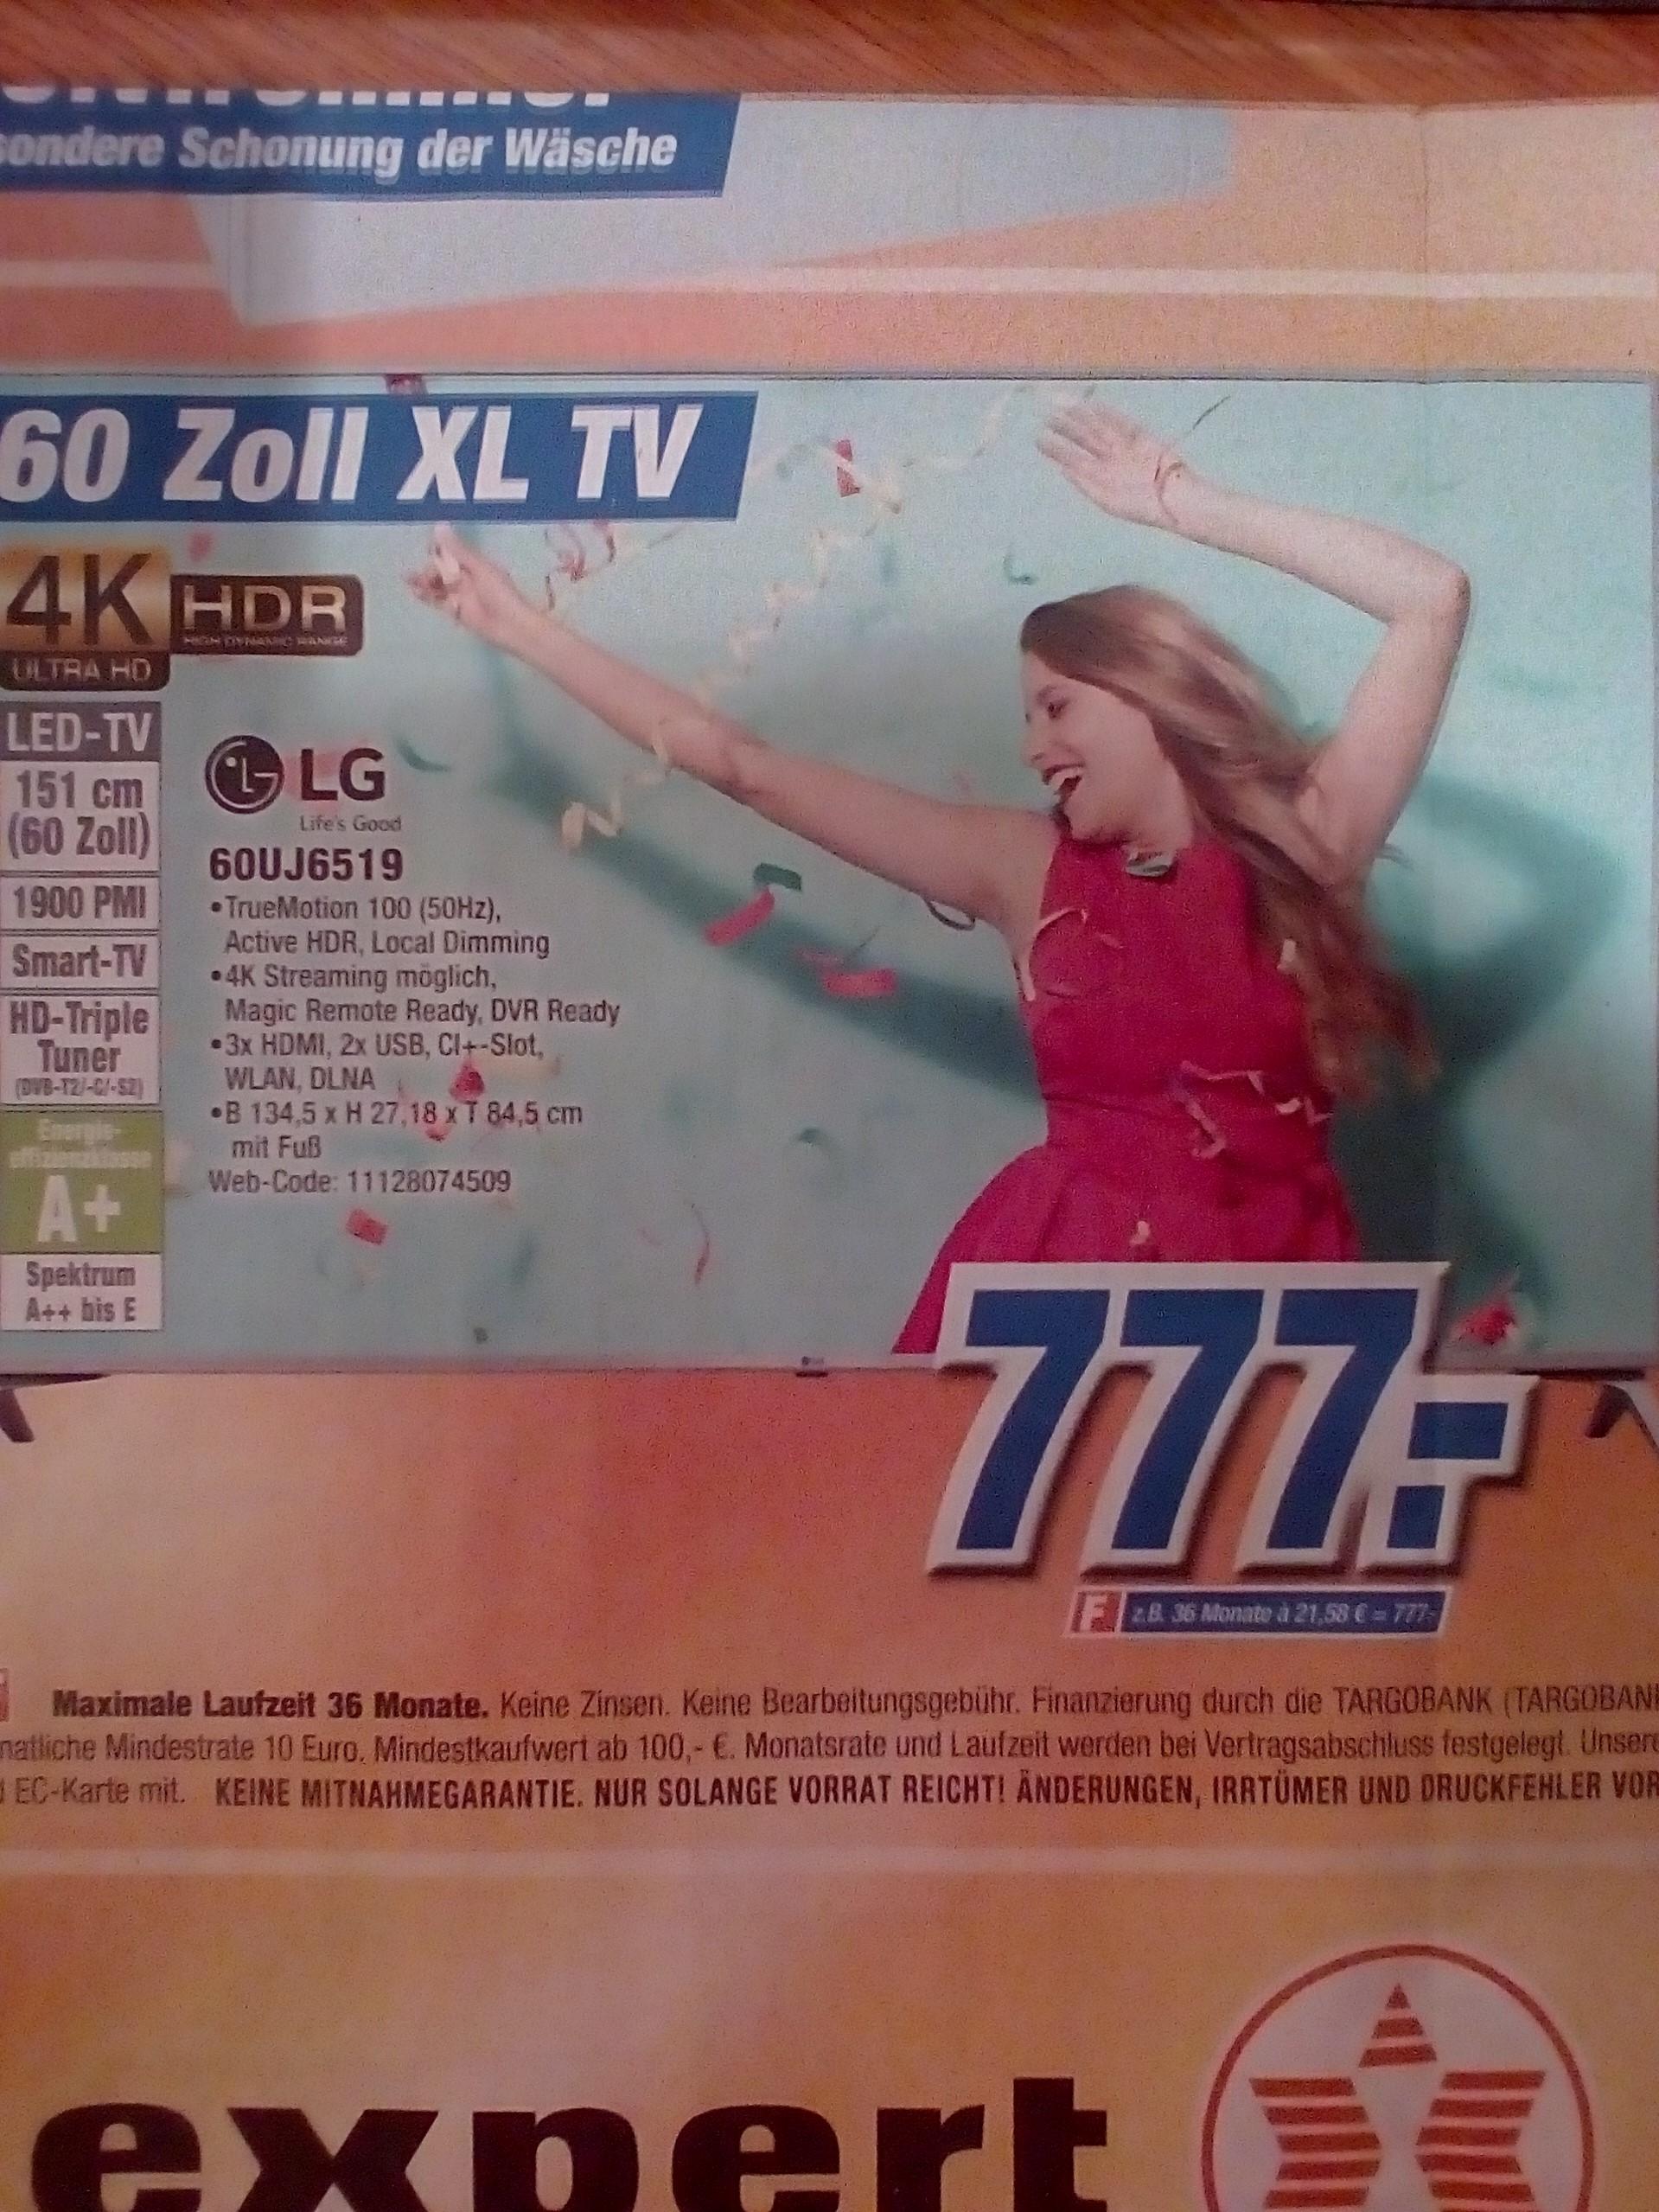 [Lokal Plz 47475] Fernseher LCD-TV LG 60UJ6519 für 777,-€